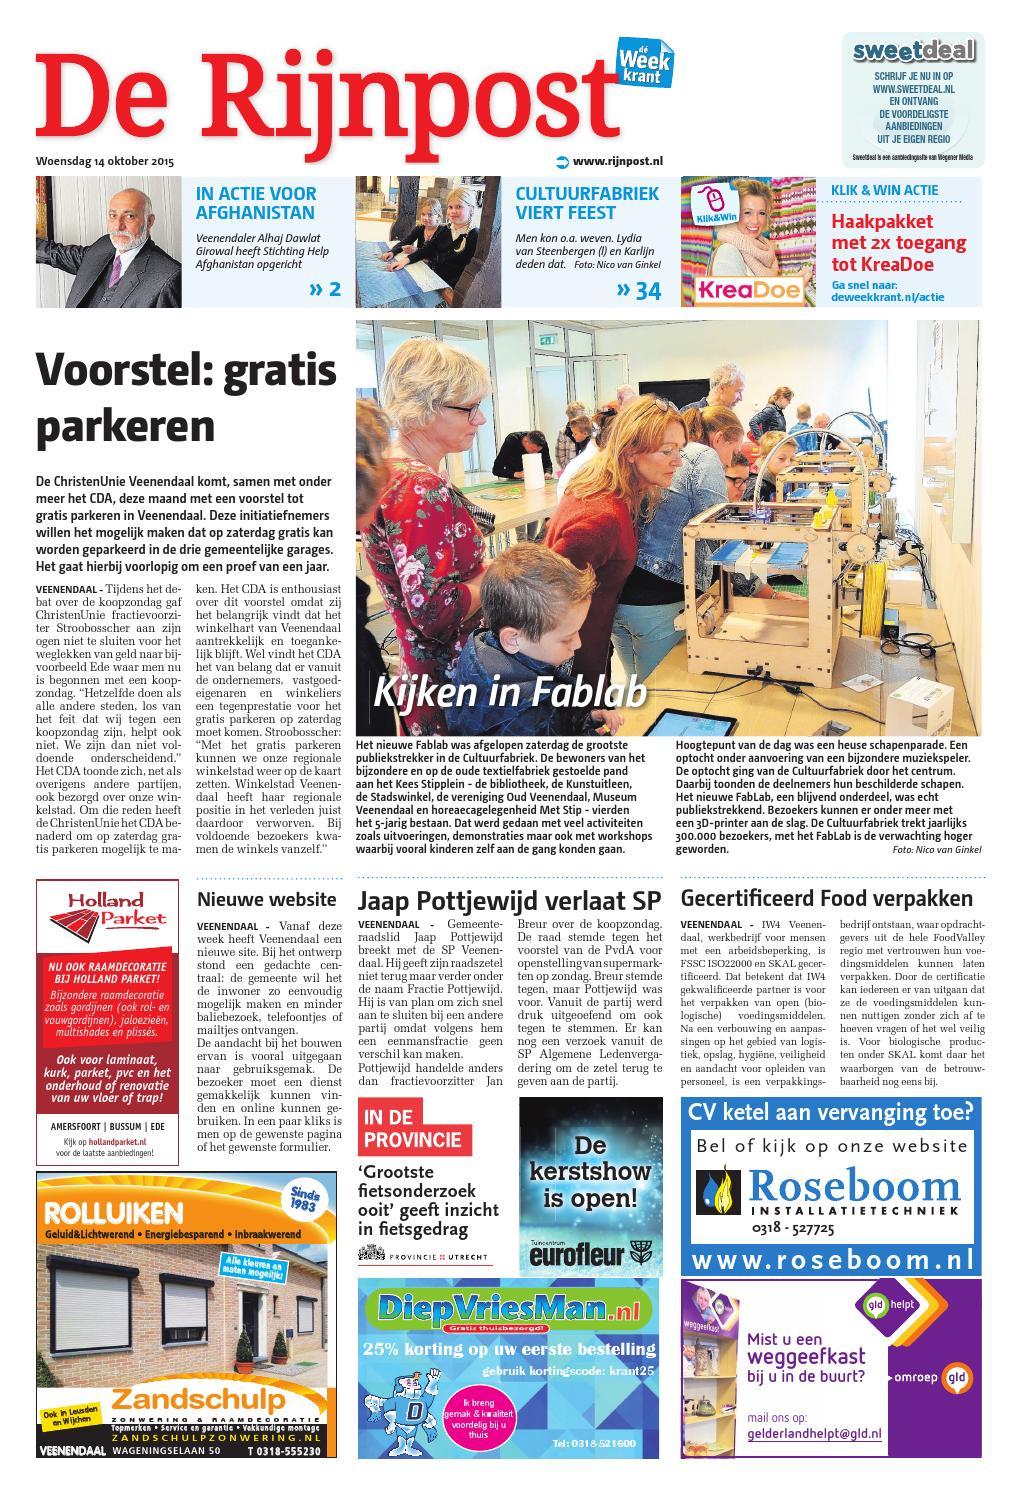 de rijnpost week42 by wegener issuu